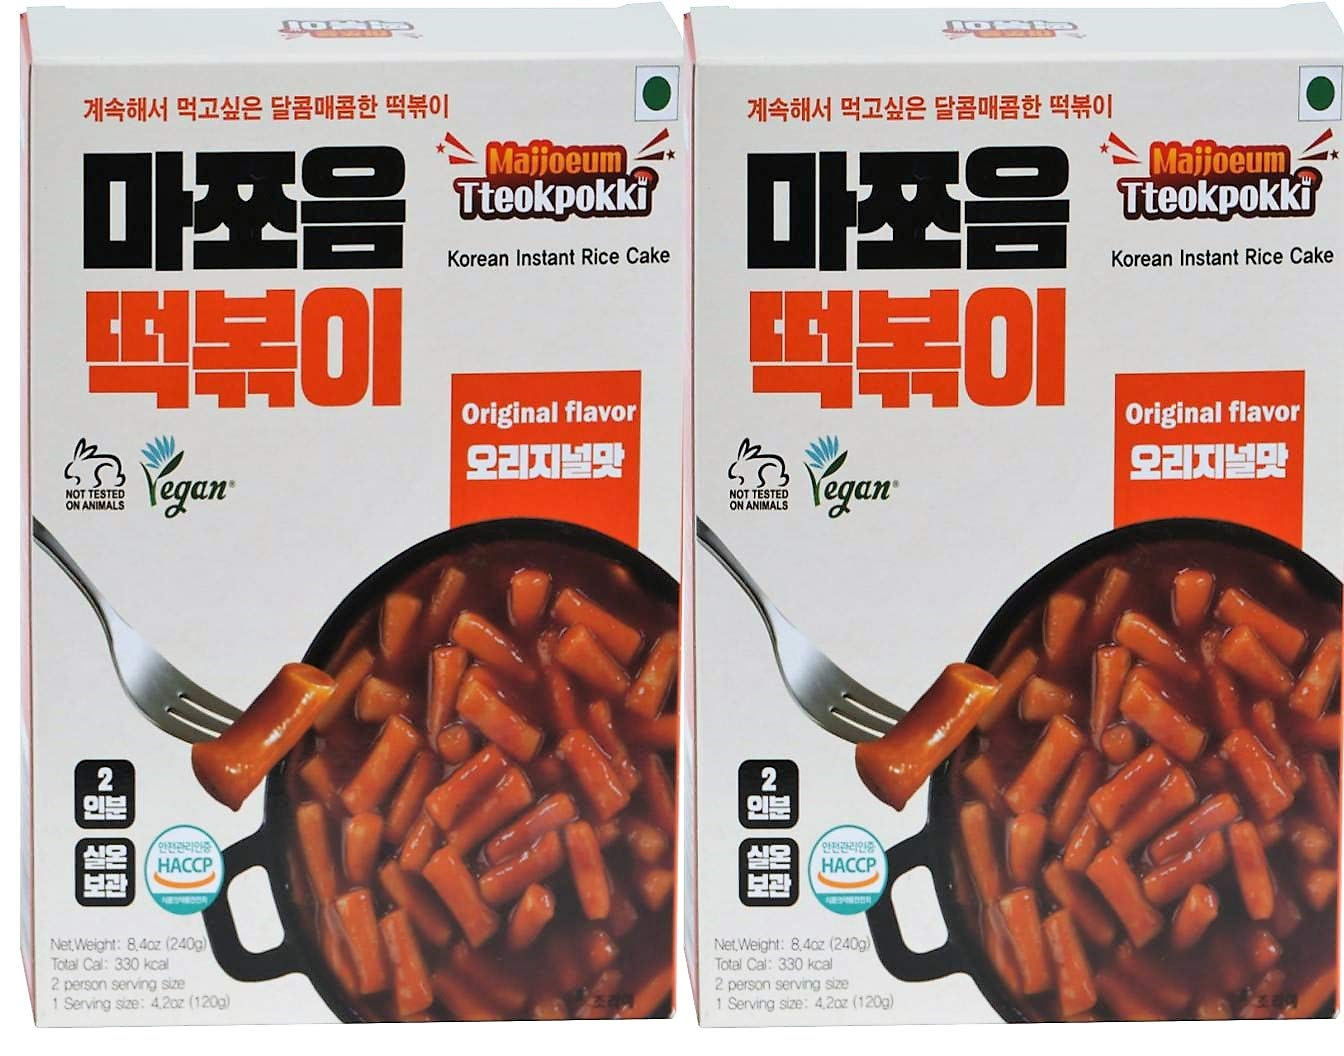 Vegan SD Foods Majjoeum Original Flavor Tteokbokki Korean Instant Rice Cake - Pack of 2 (4 Servings) - Korean Street Foods - 100% Vegetable Ingredients 떡볶이 (Original (Vegan))